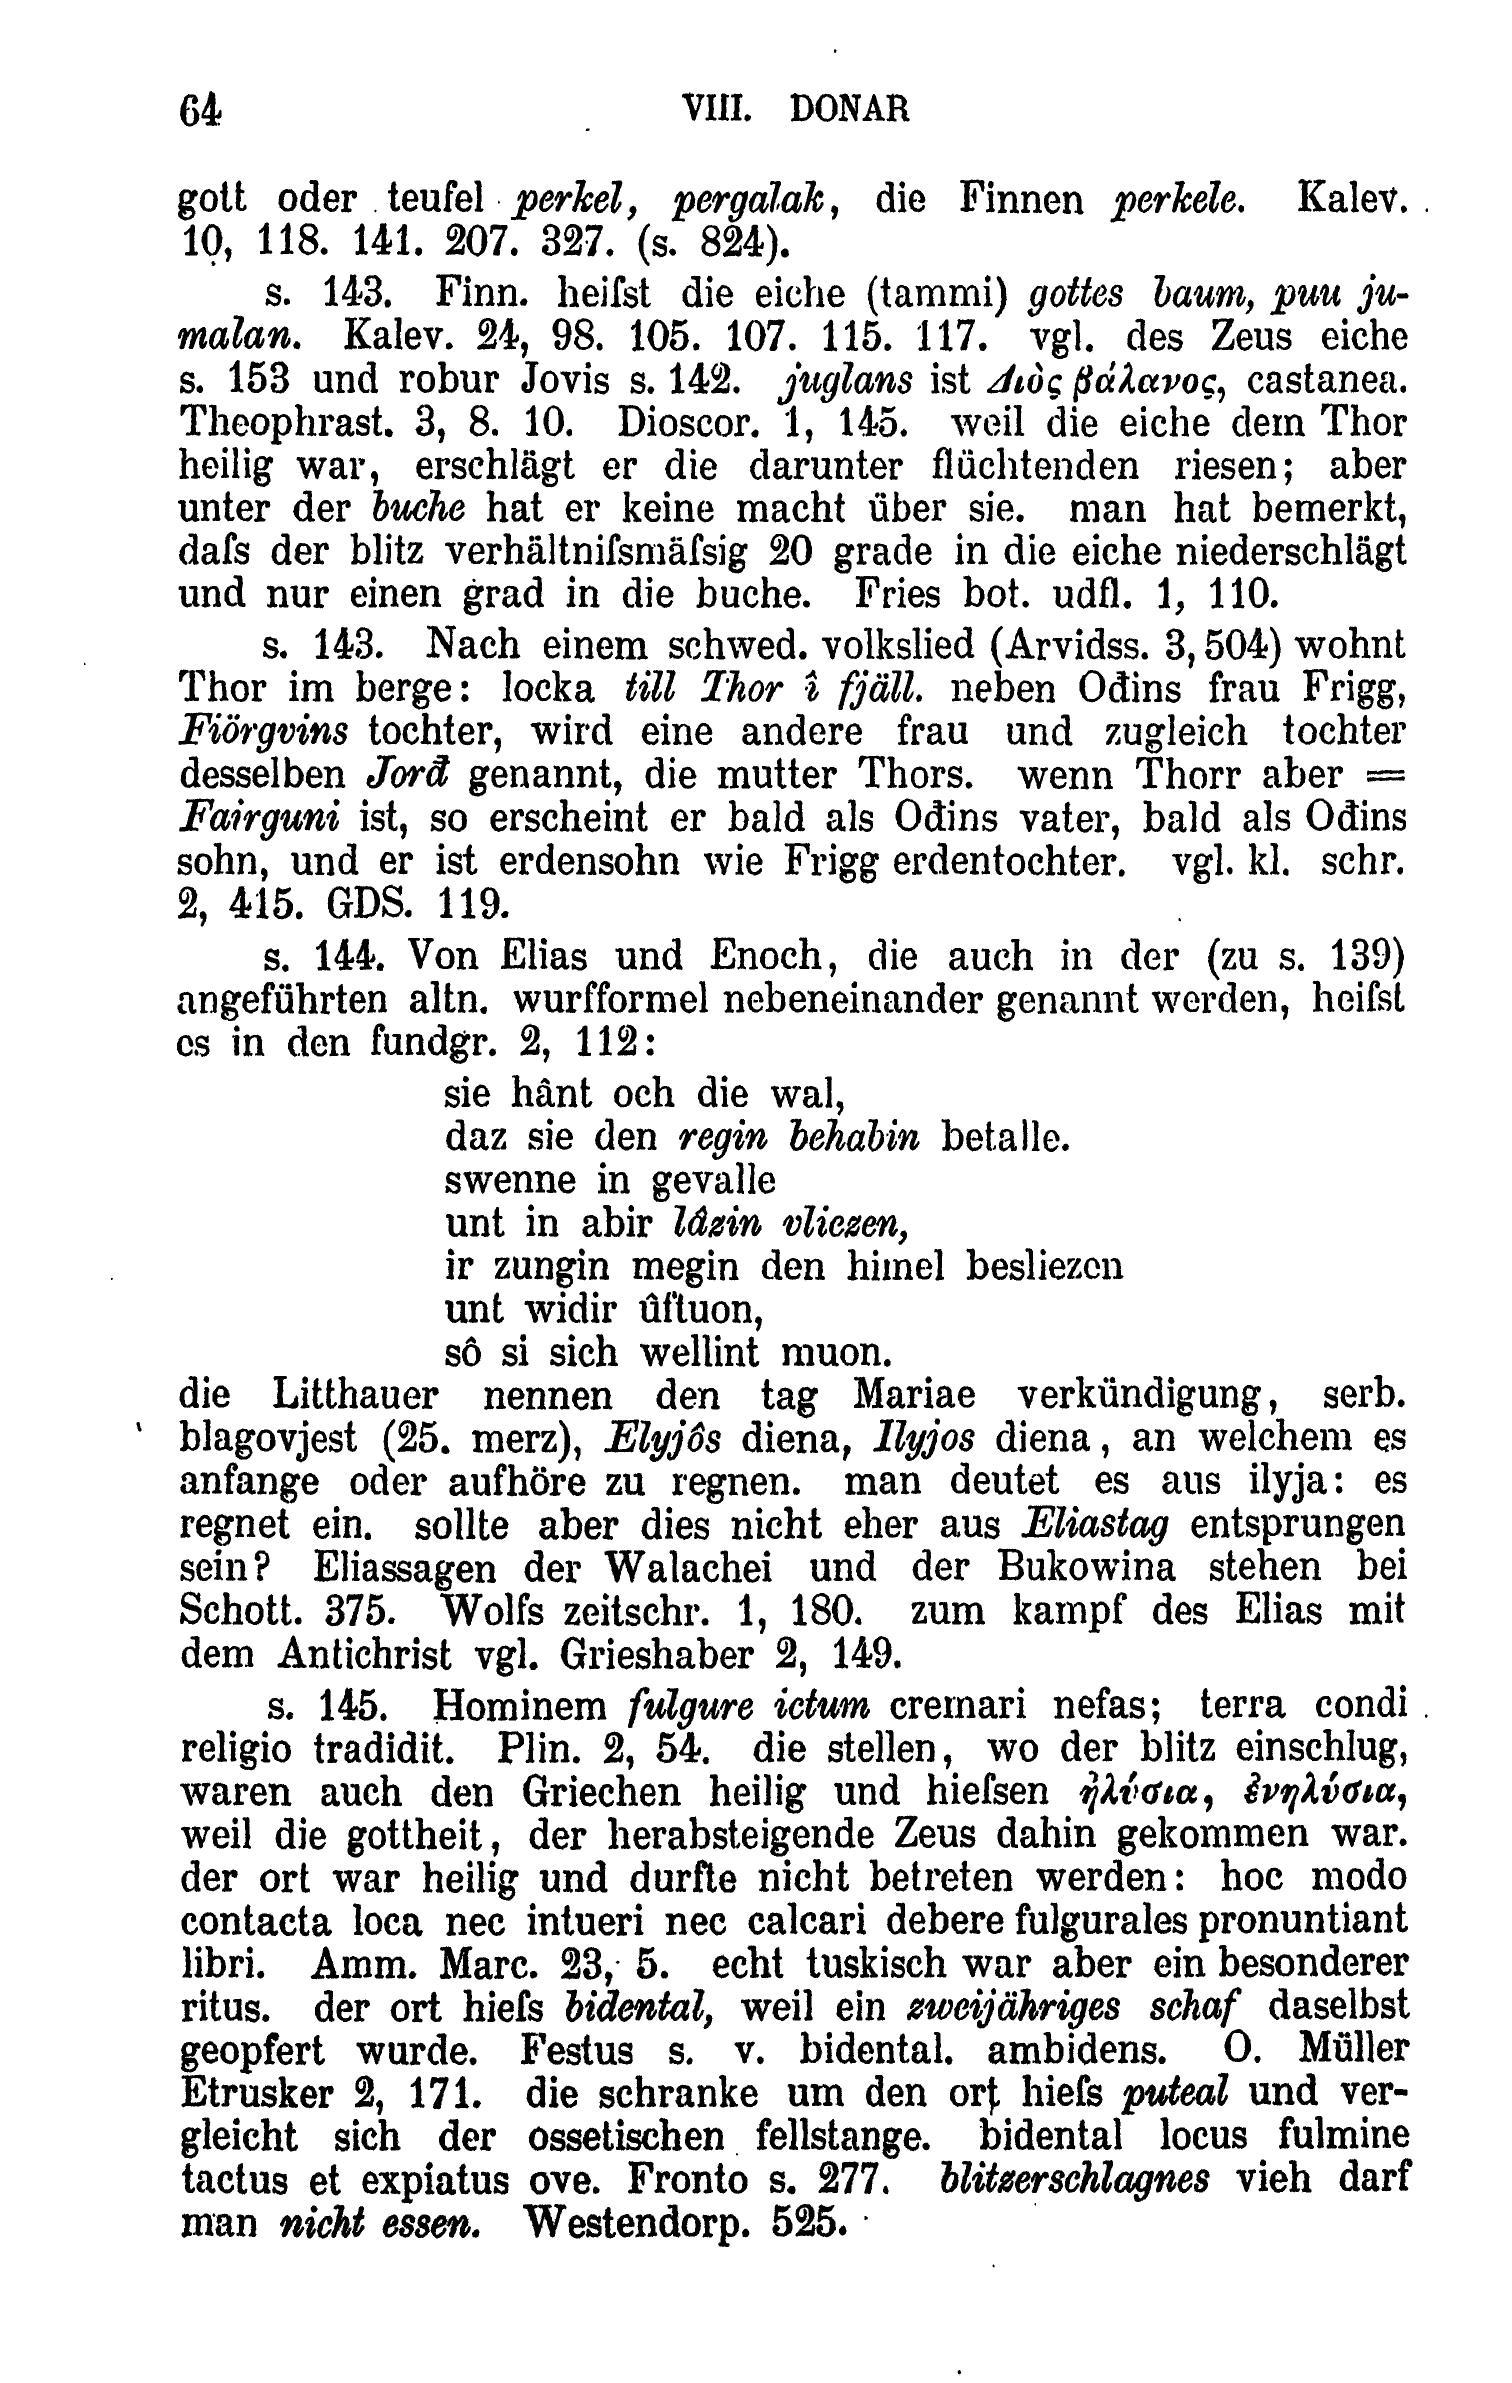 File:Deutsche Mythologie (Grimm) V3 078.jpg - Wikimedia Commons